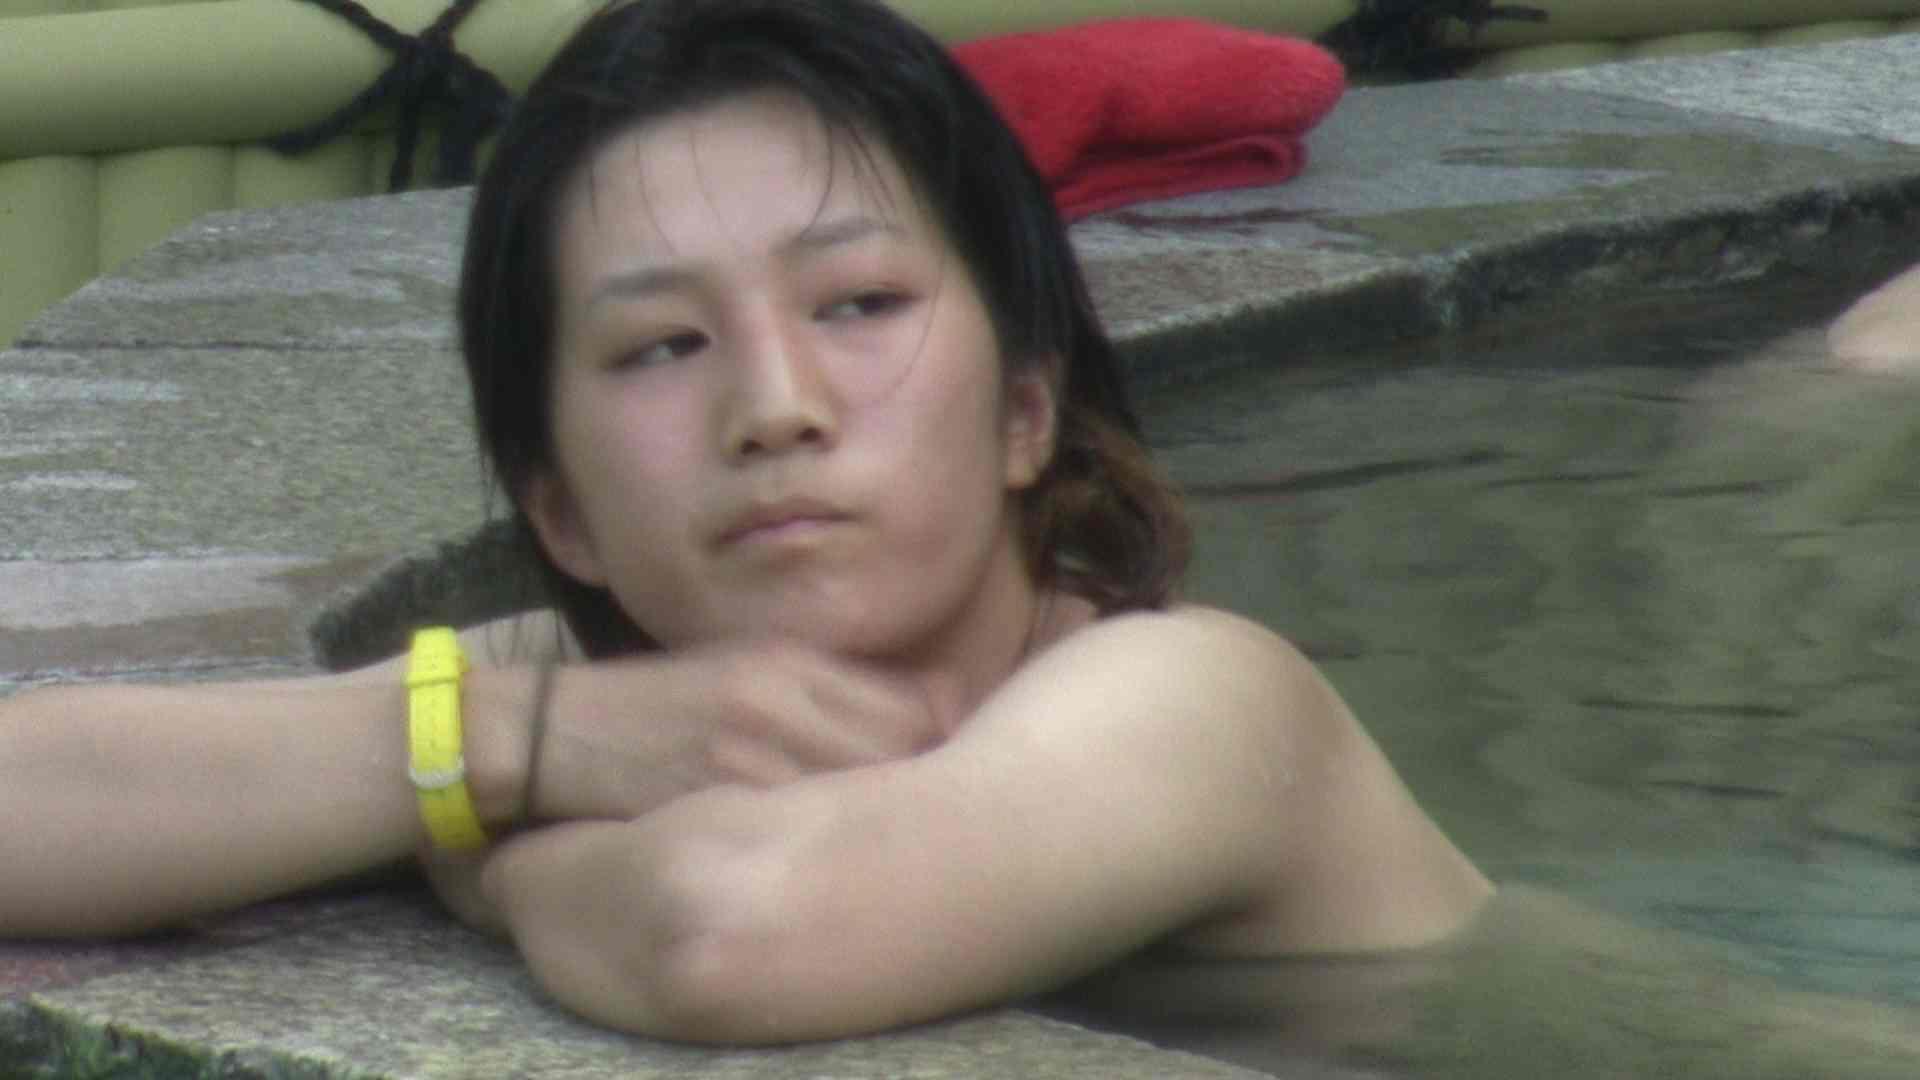 Aquaな露天風呂Vol.132 盗撮映像  31Pix 23